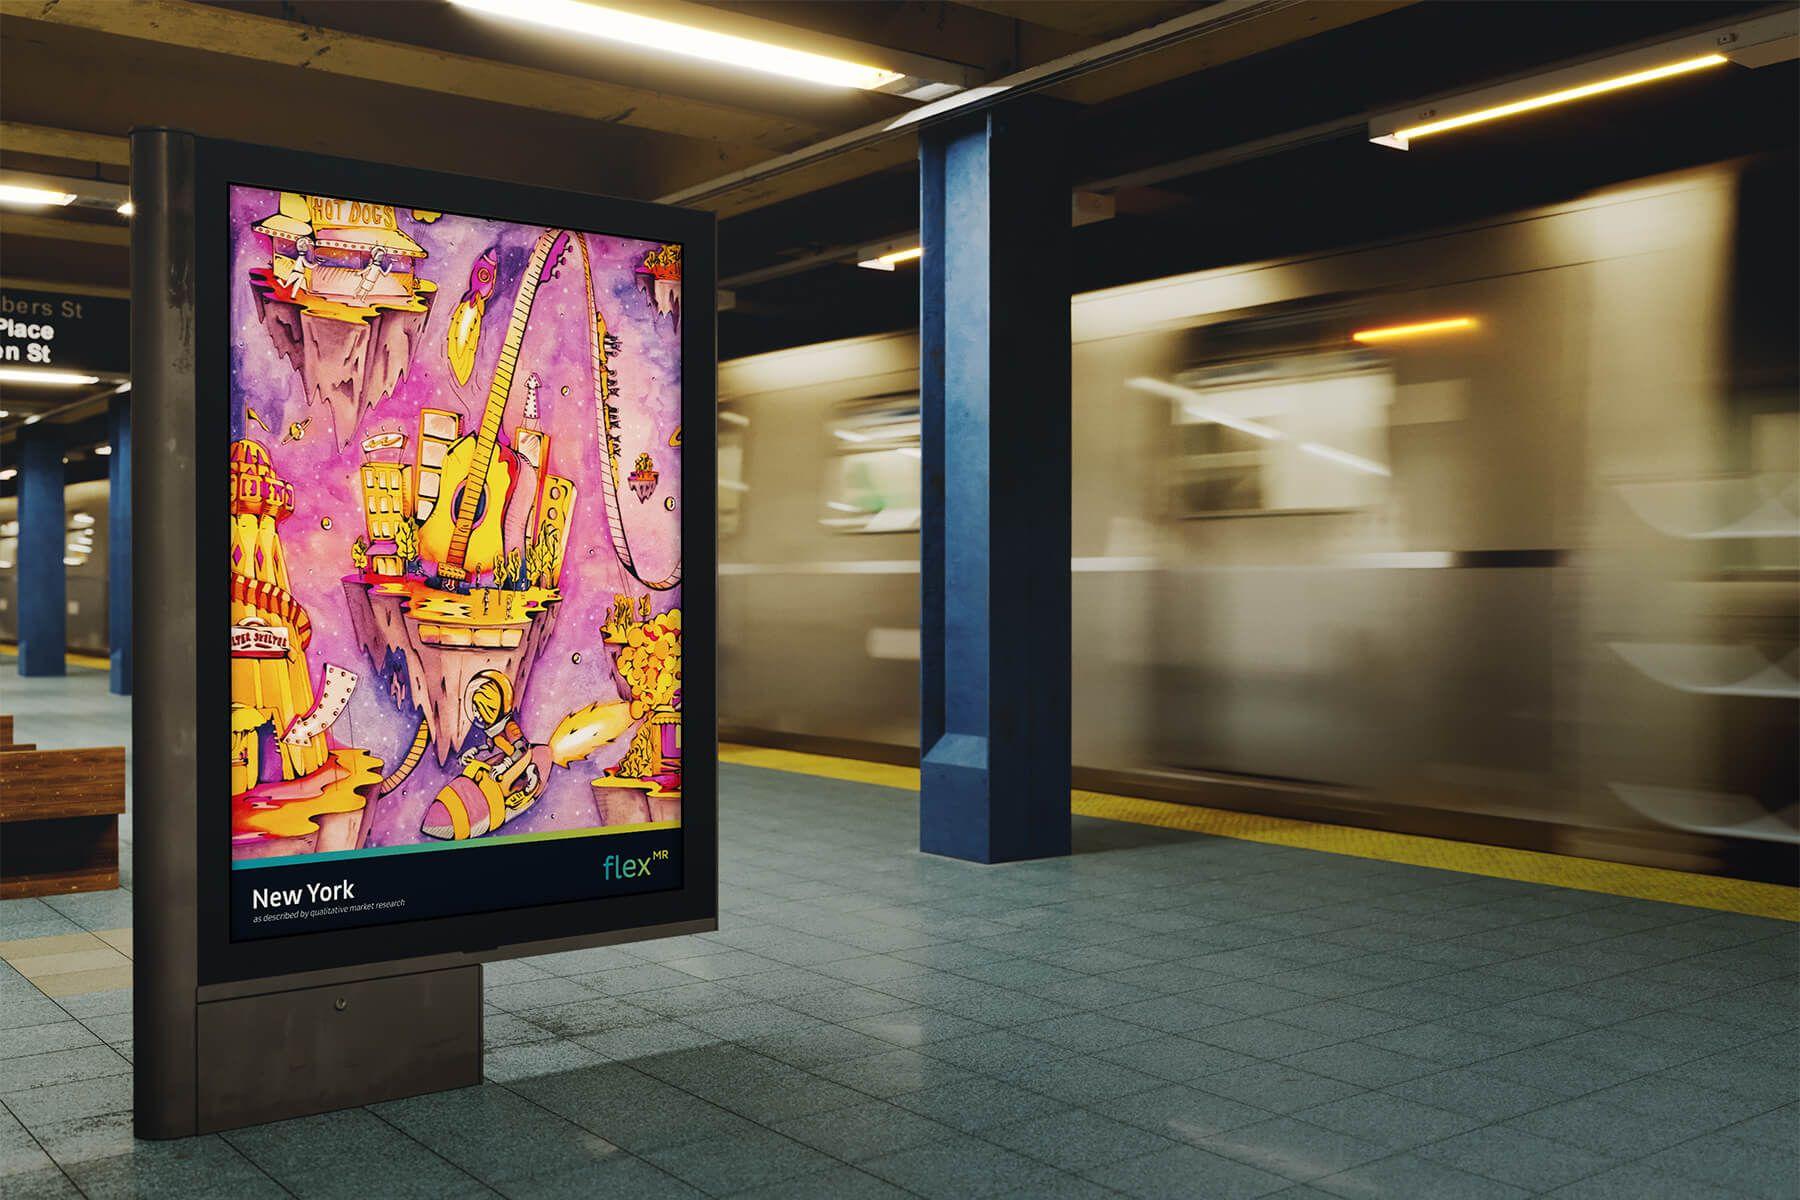 Press Photo - New York Advert